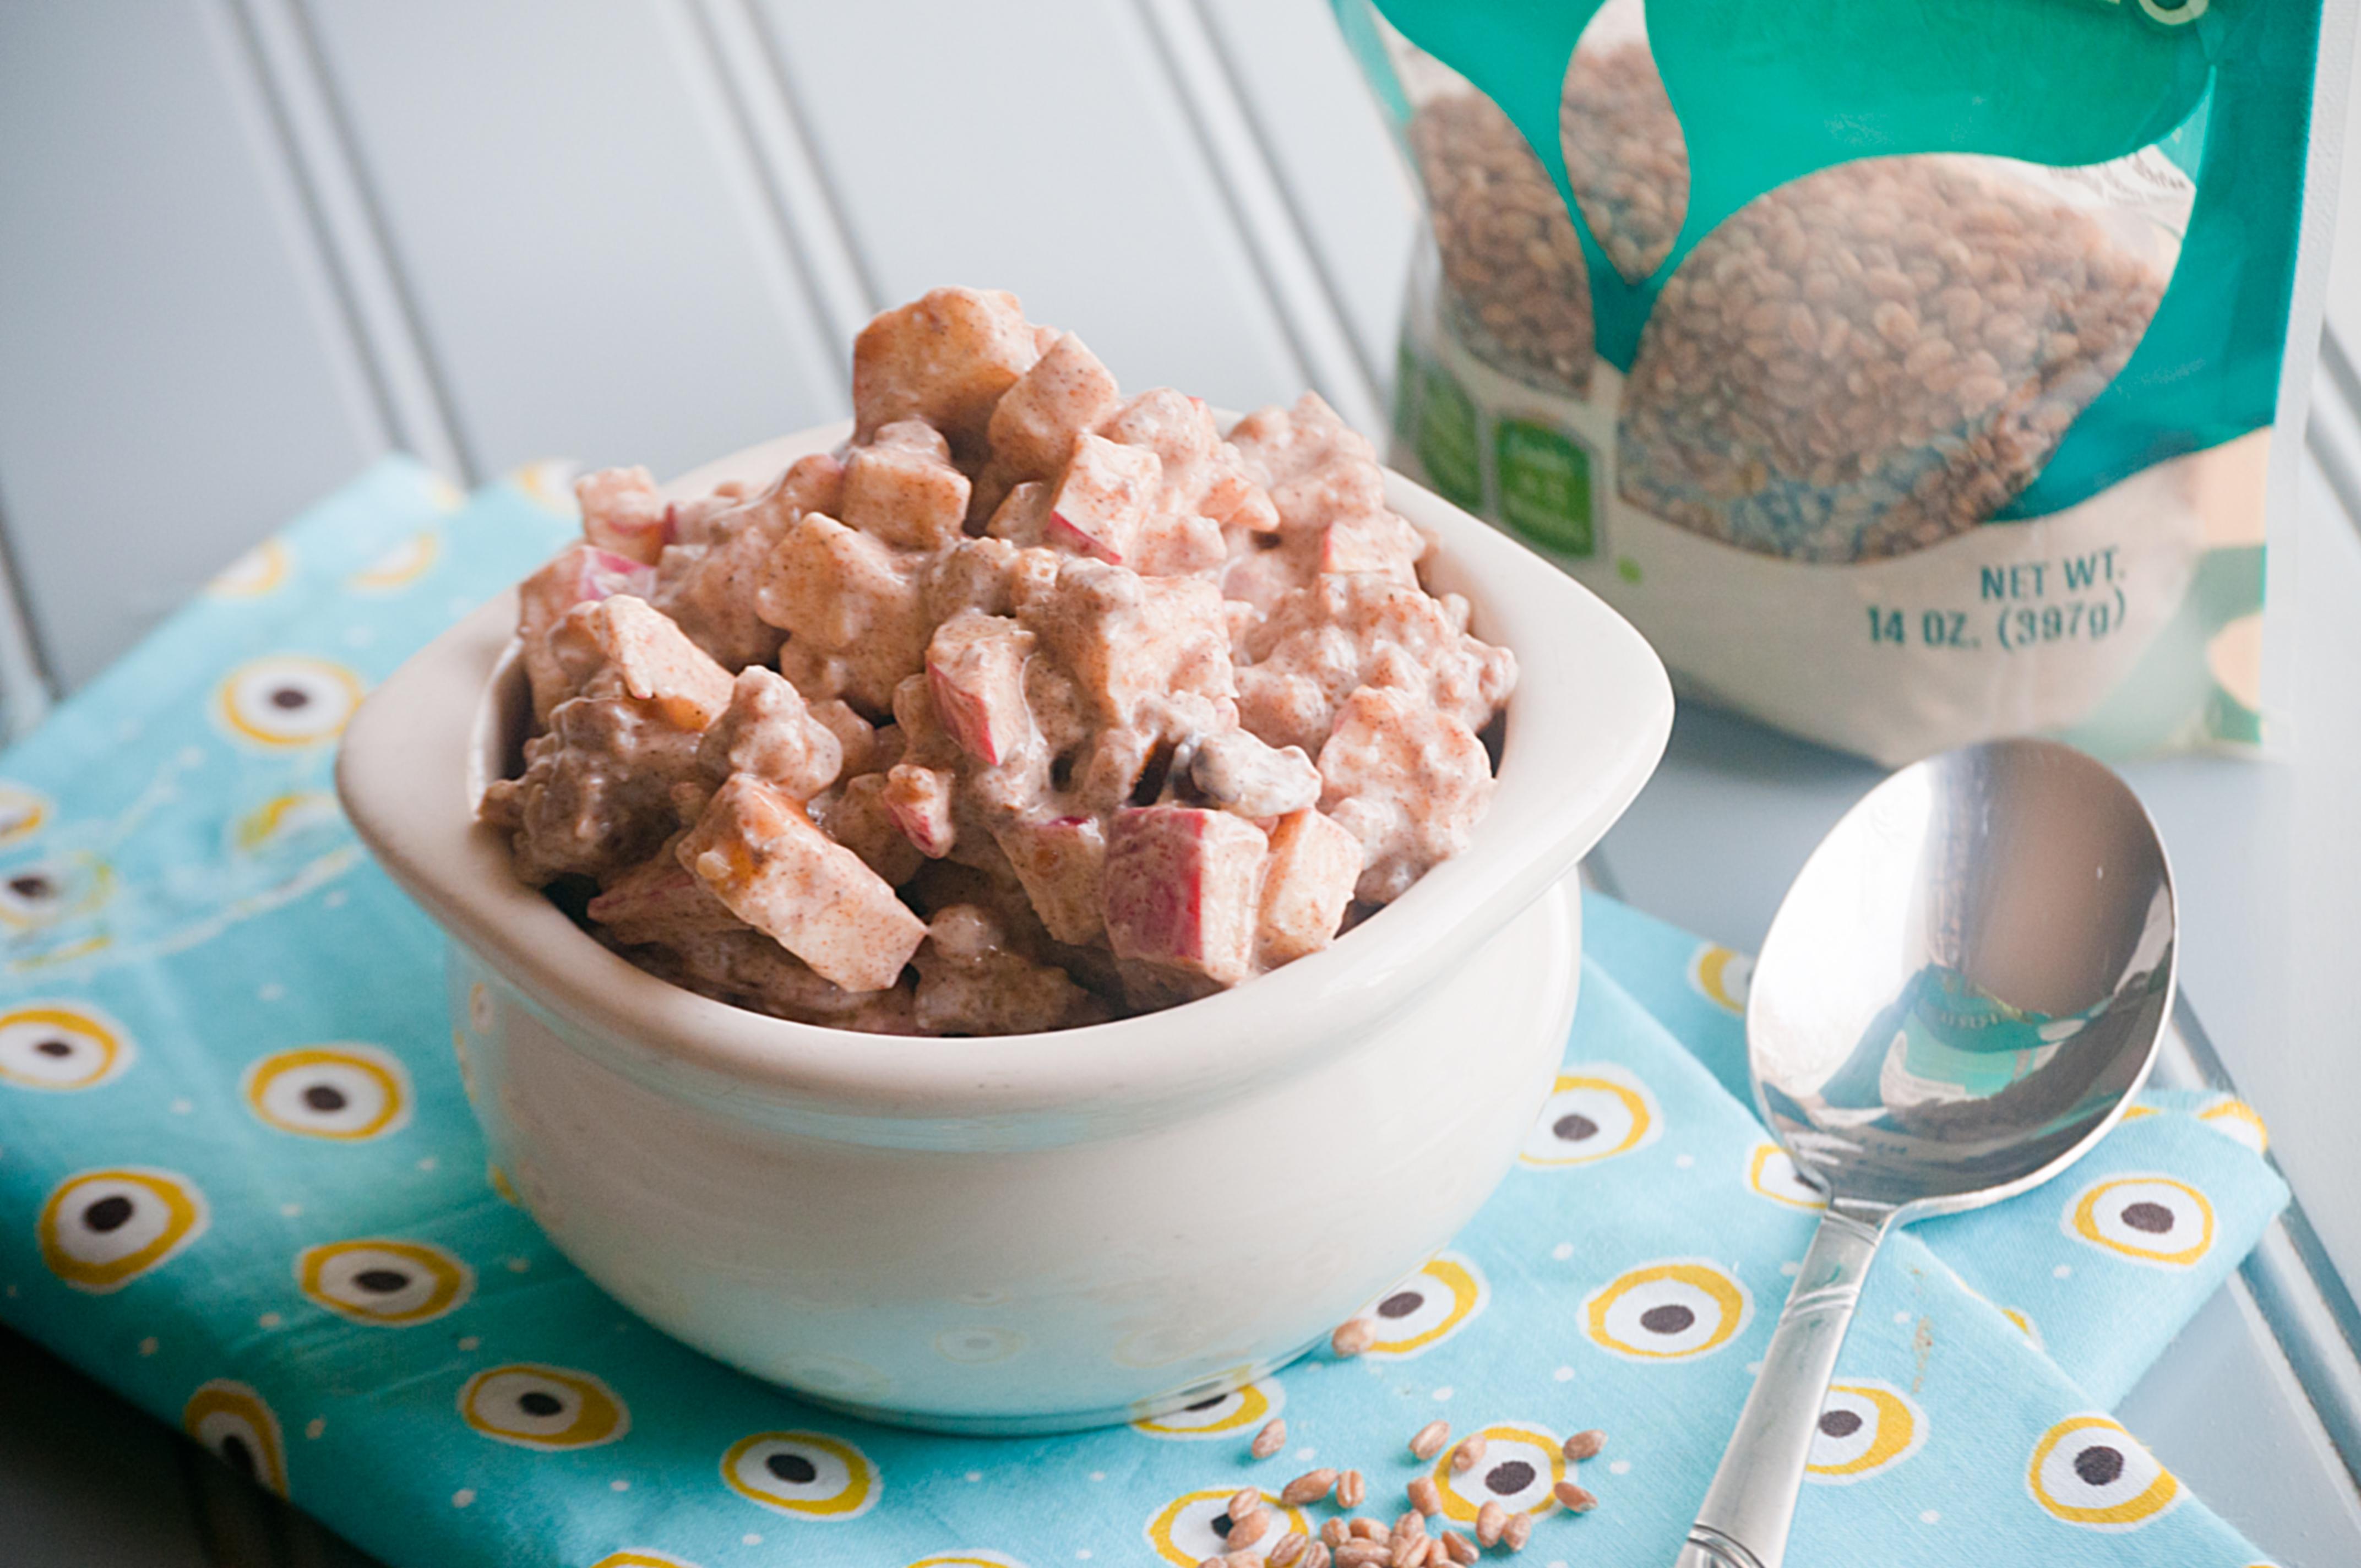 Apple Pie Wheat Berry Salad